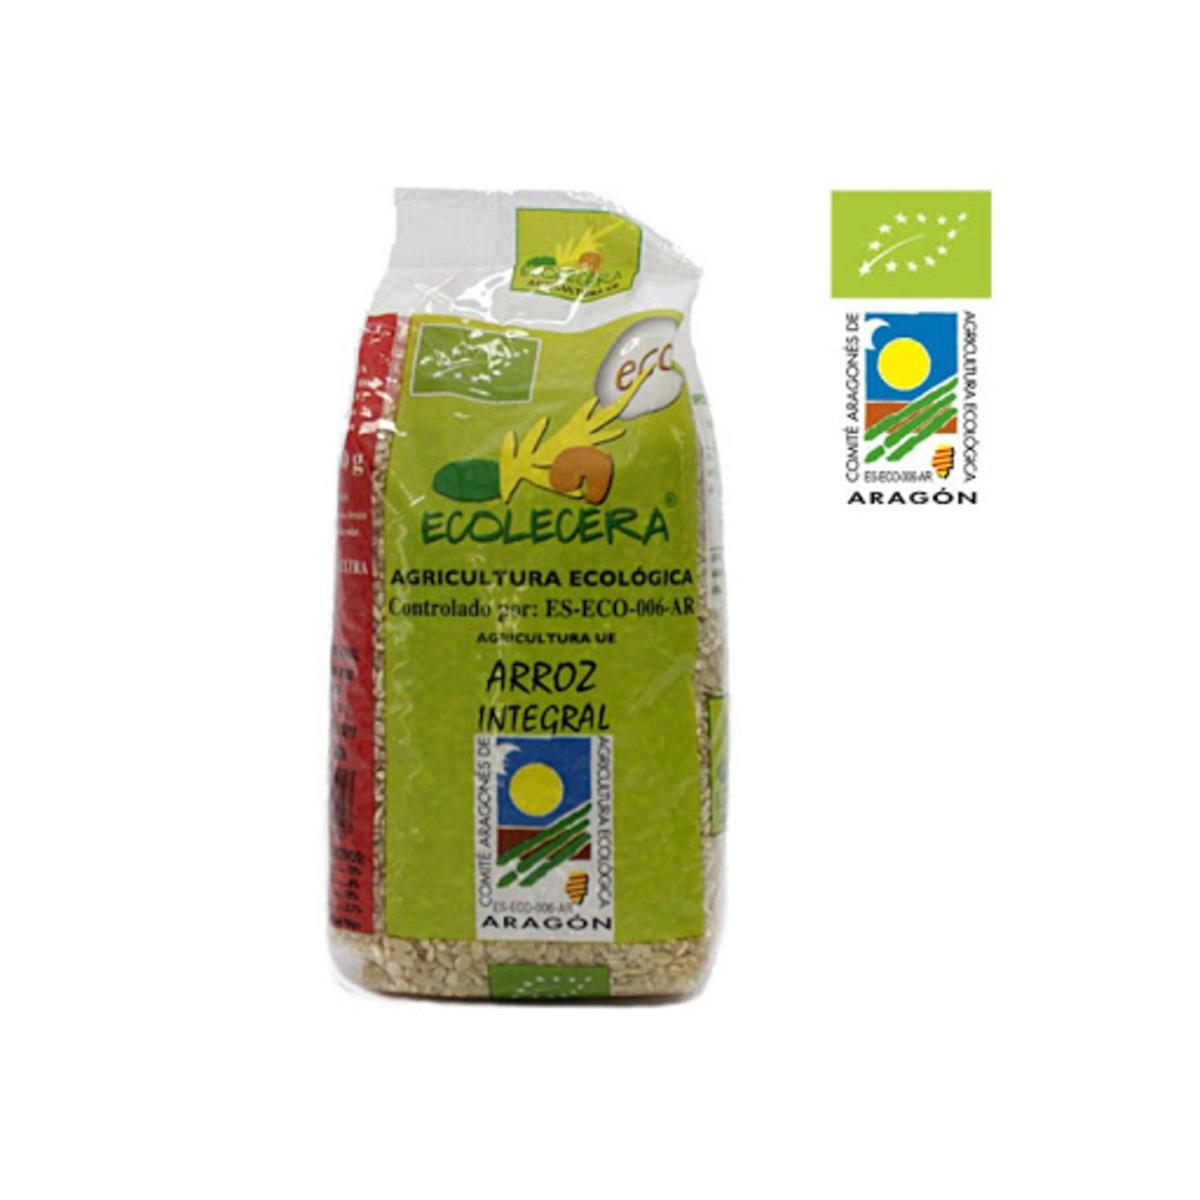 Arroz Integral Ecológico 500g. Ecolécera